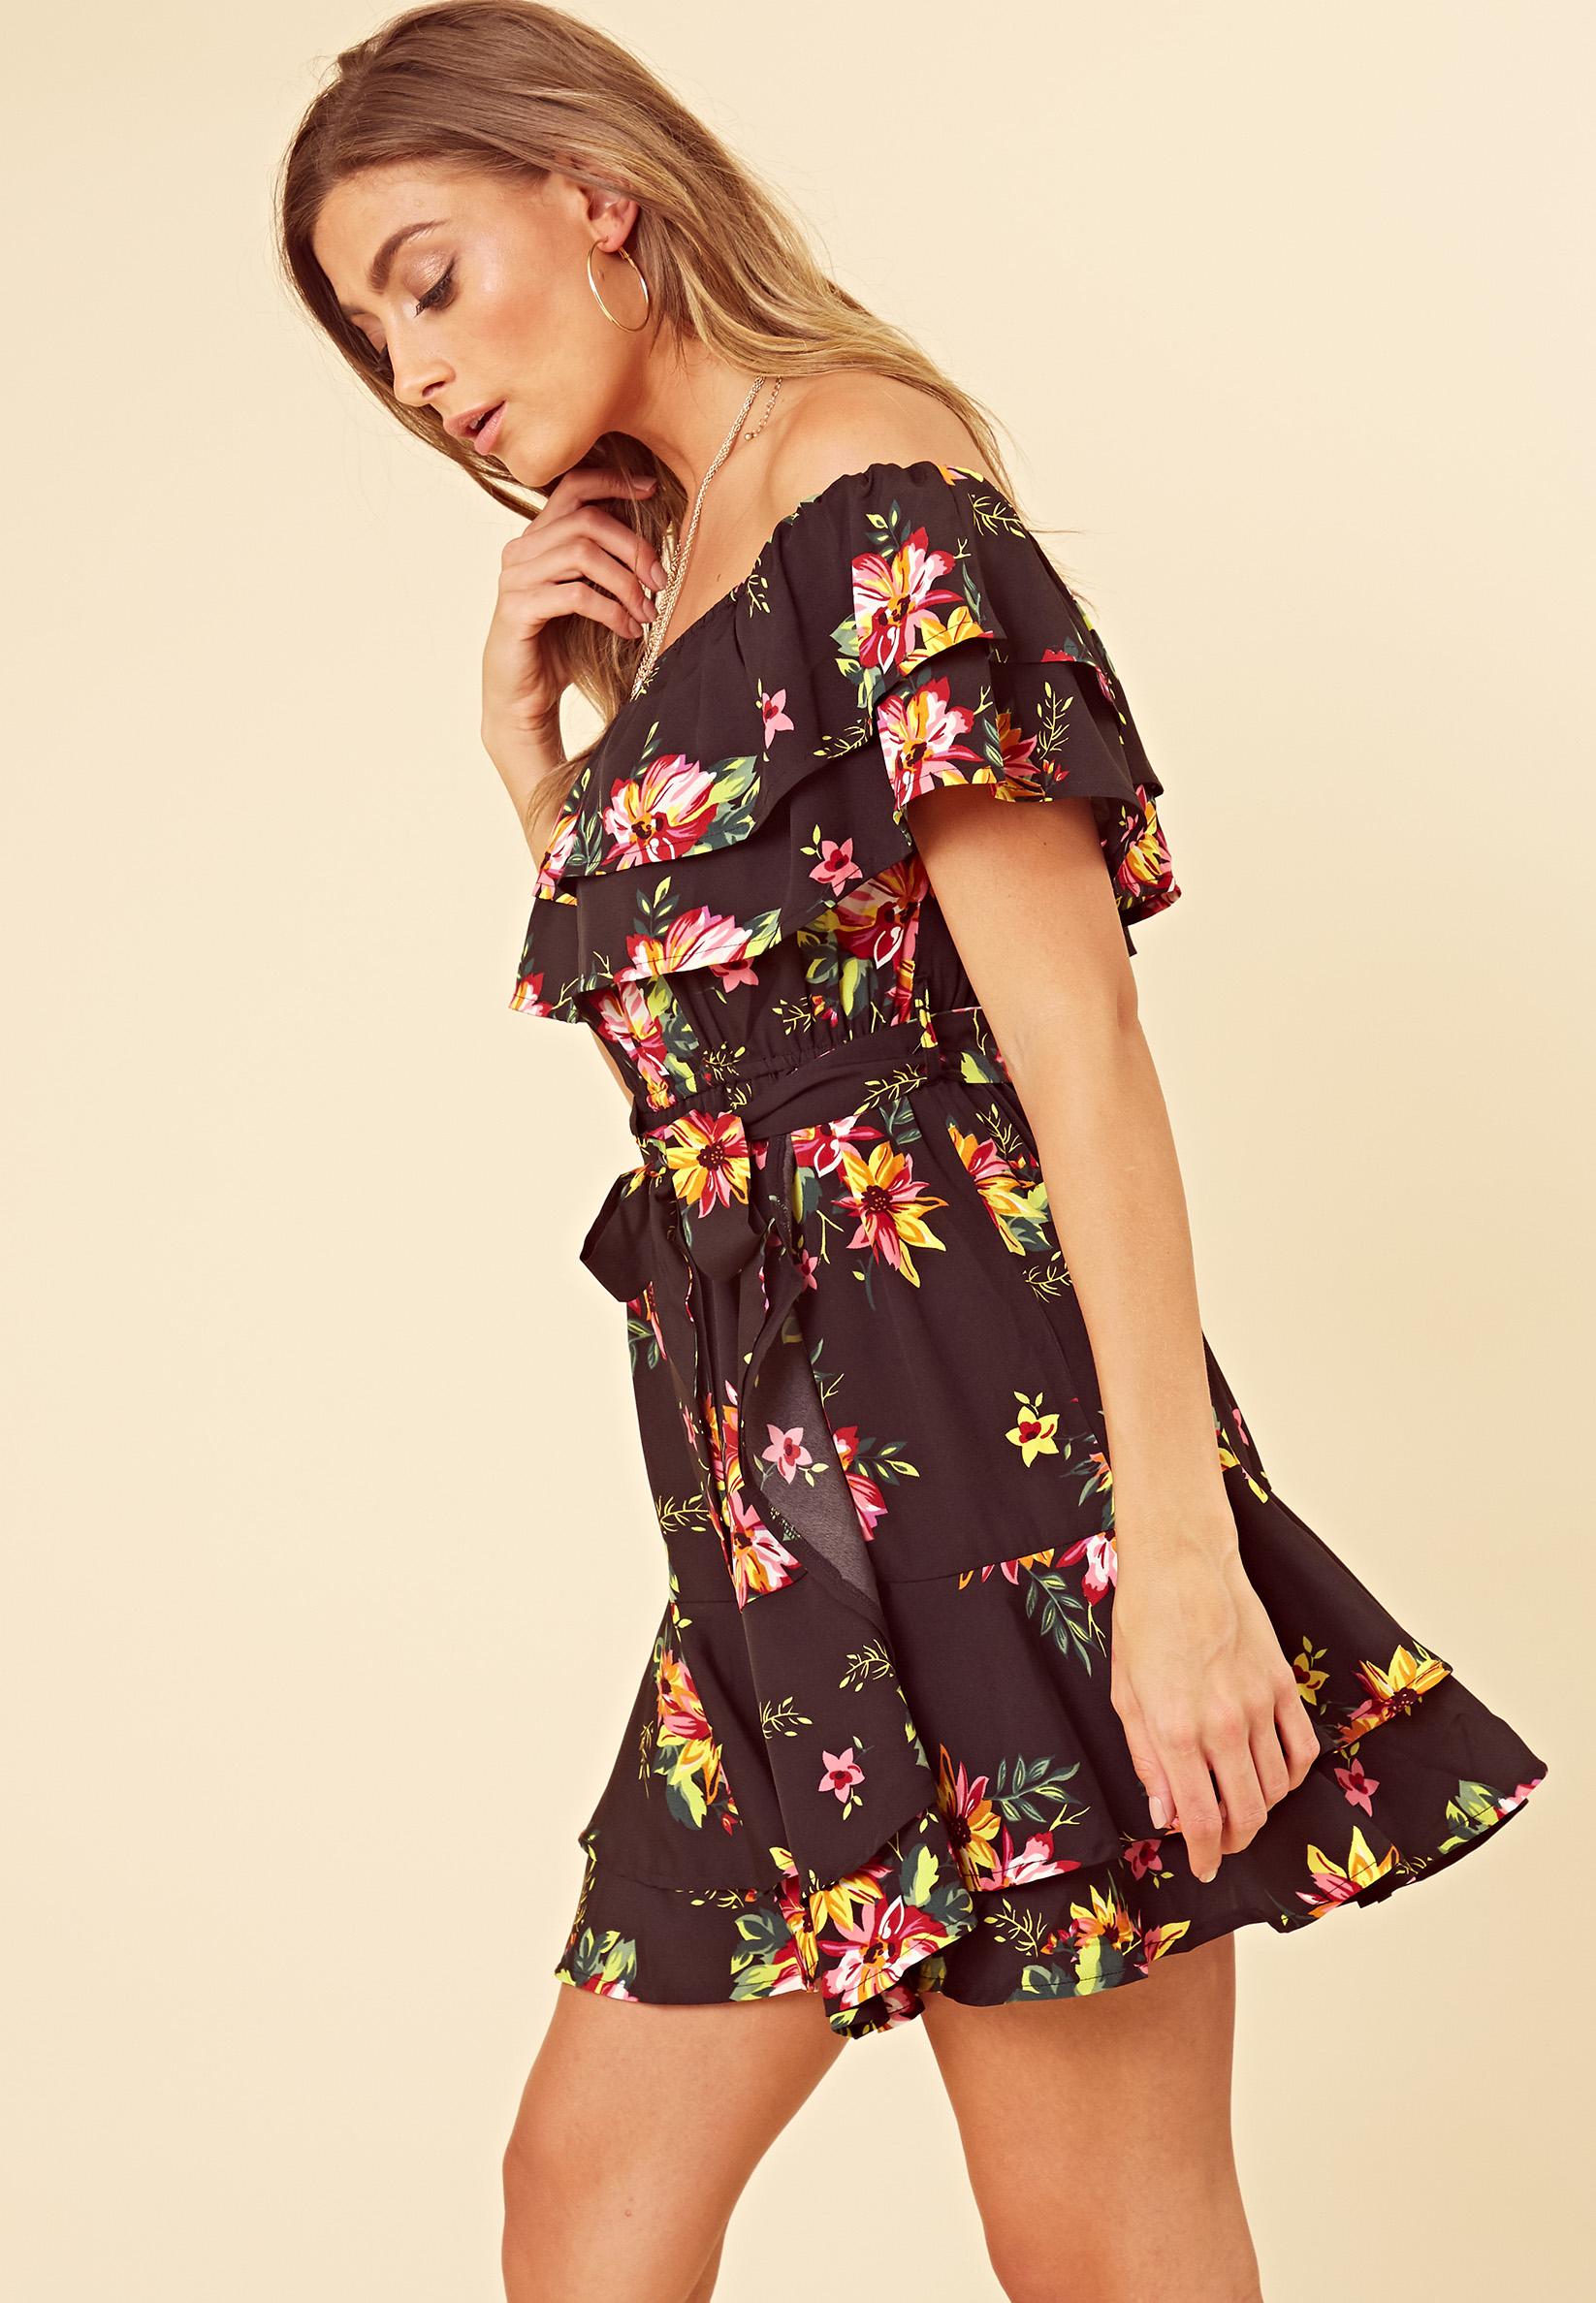 8475c2eb6 Black Floral Bardot Frill Hem Skater Dress l Influence Fashion ...